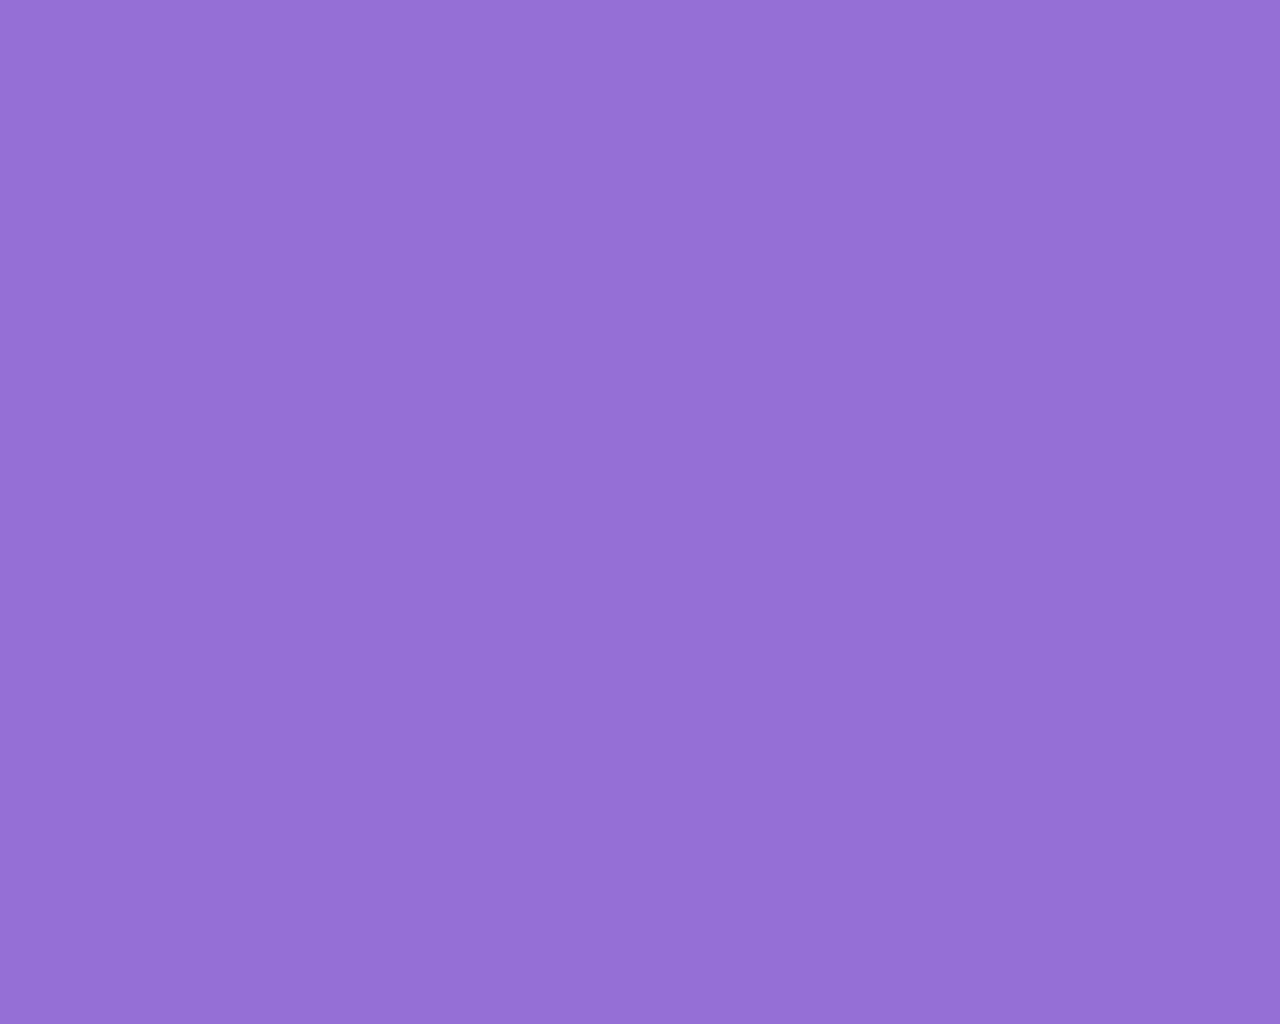 1280x1024 Dark Pastel Purple Solid Color Background